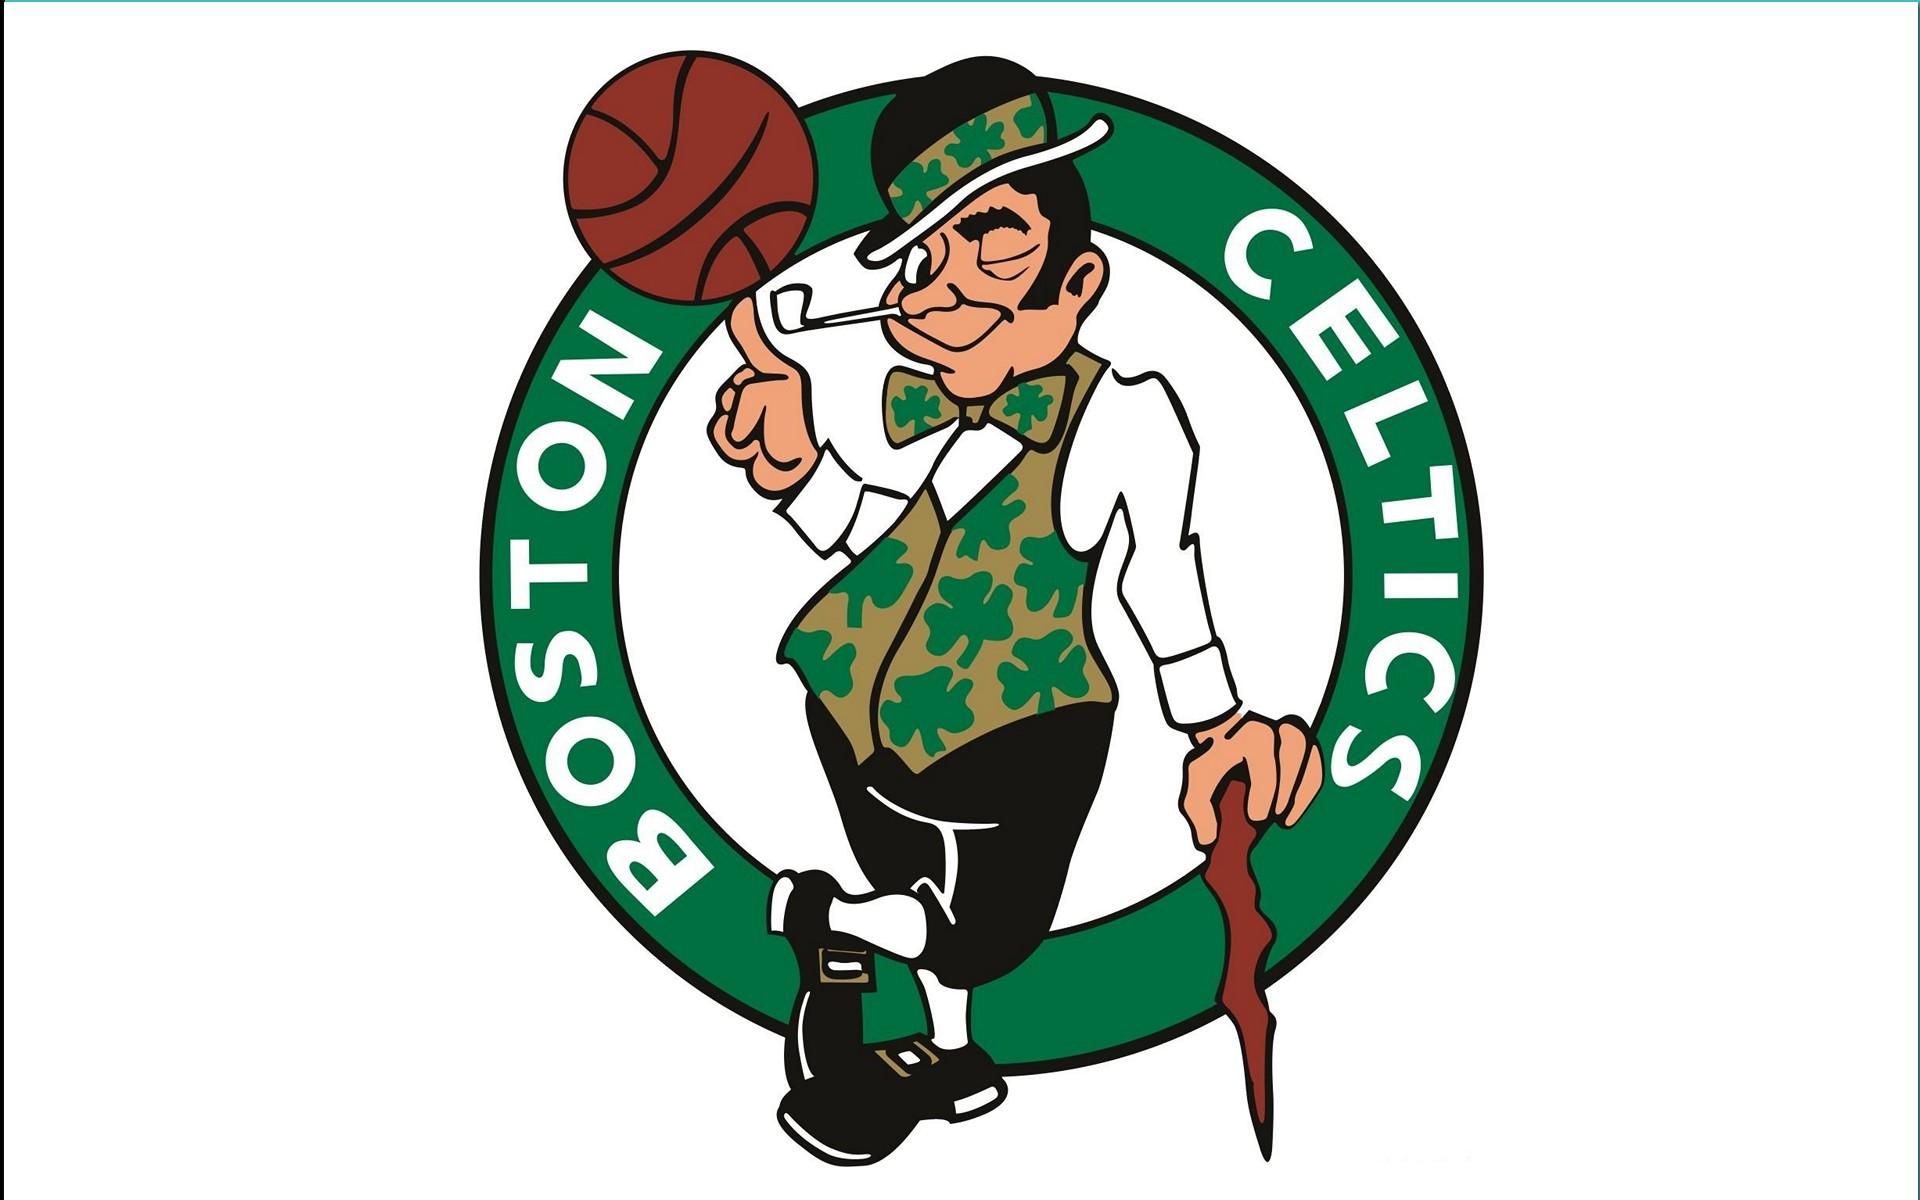 1920x1200 Nba Basketball Boston Celtics Logo White Background 1920x1200 Wide